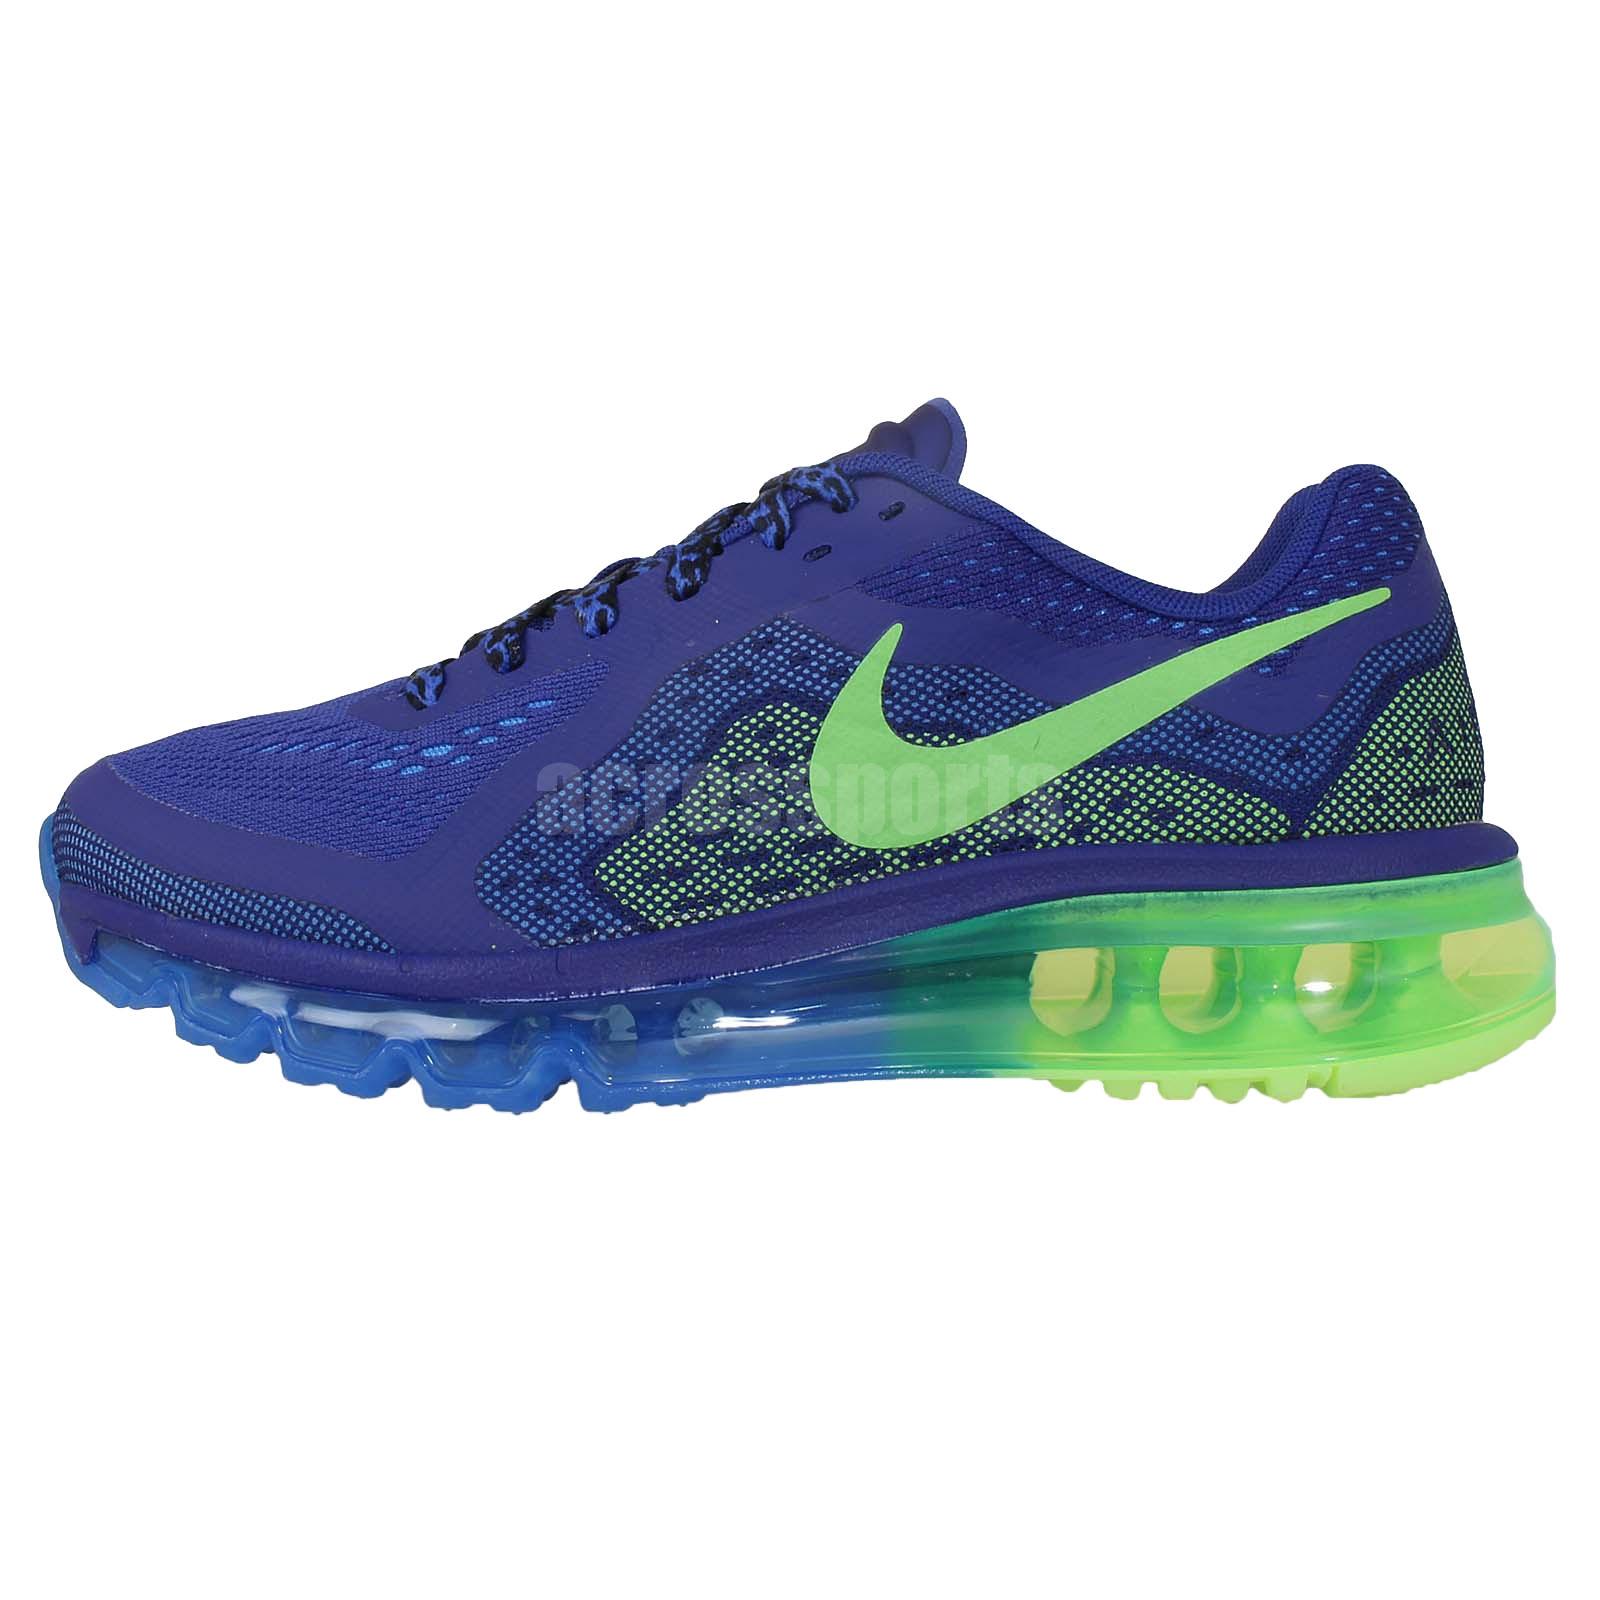 Nike Air Max 2014 GS Blue Green 2014 Youth Girls Boys ...